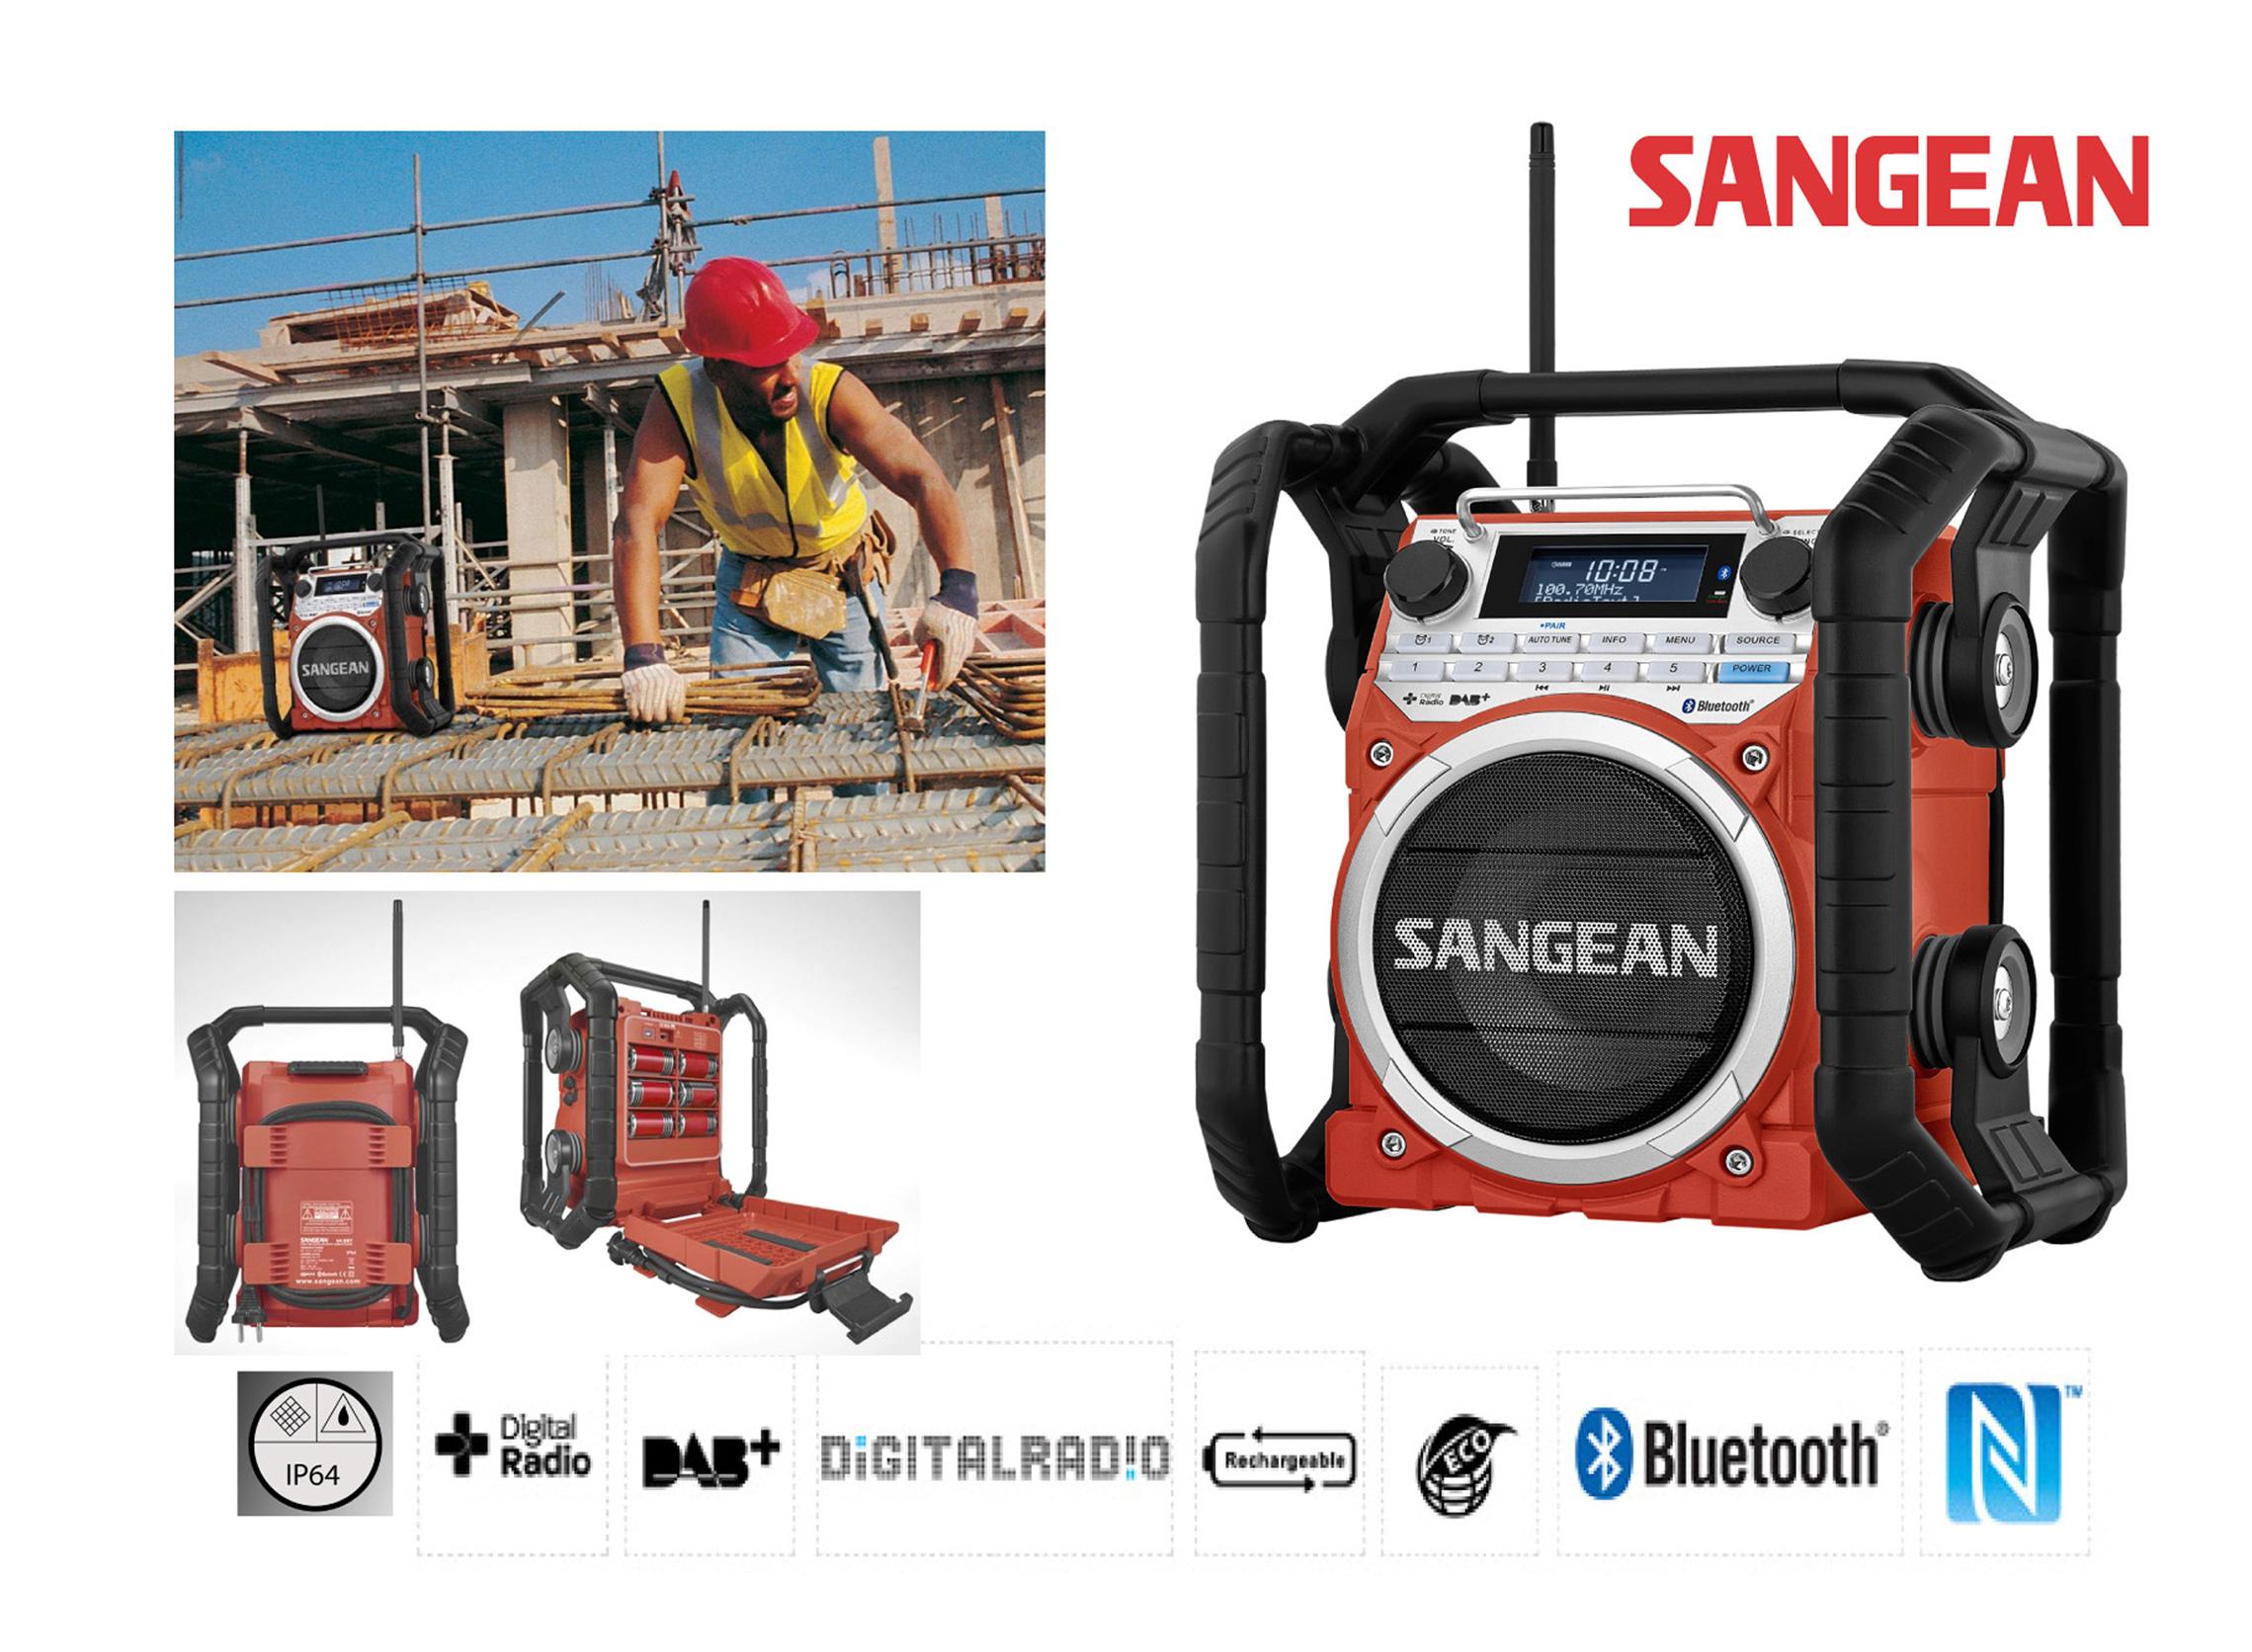 Sangean DAB Utility Radio blue